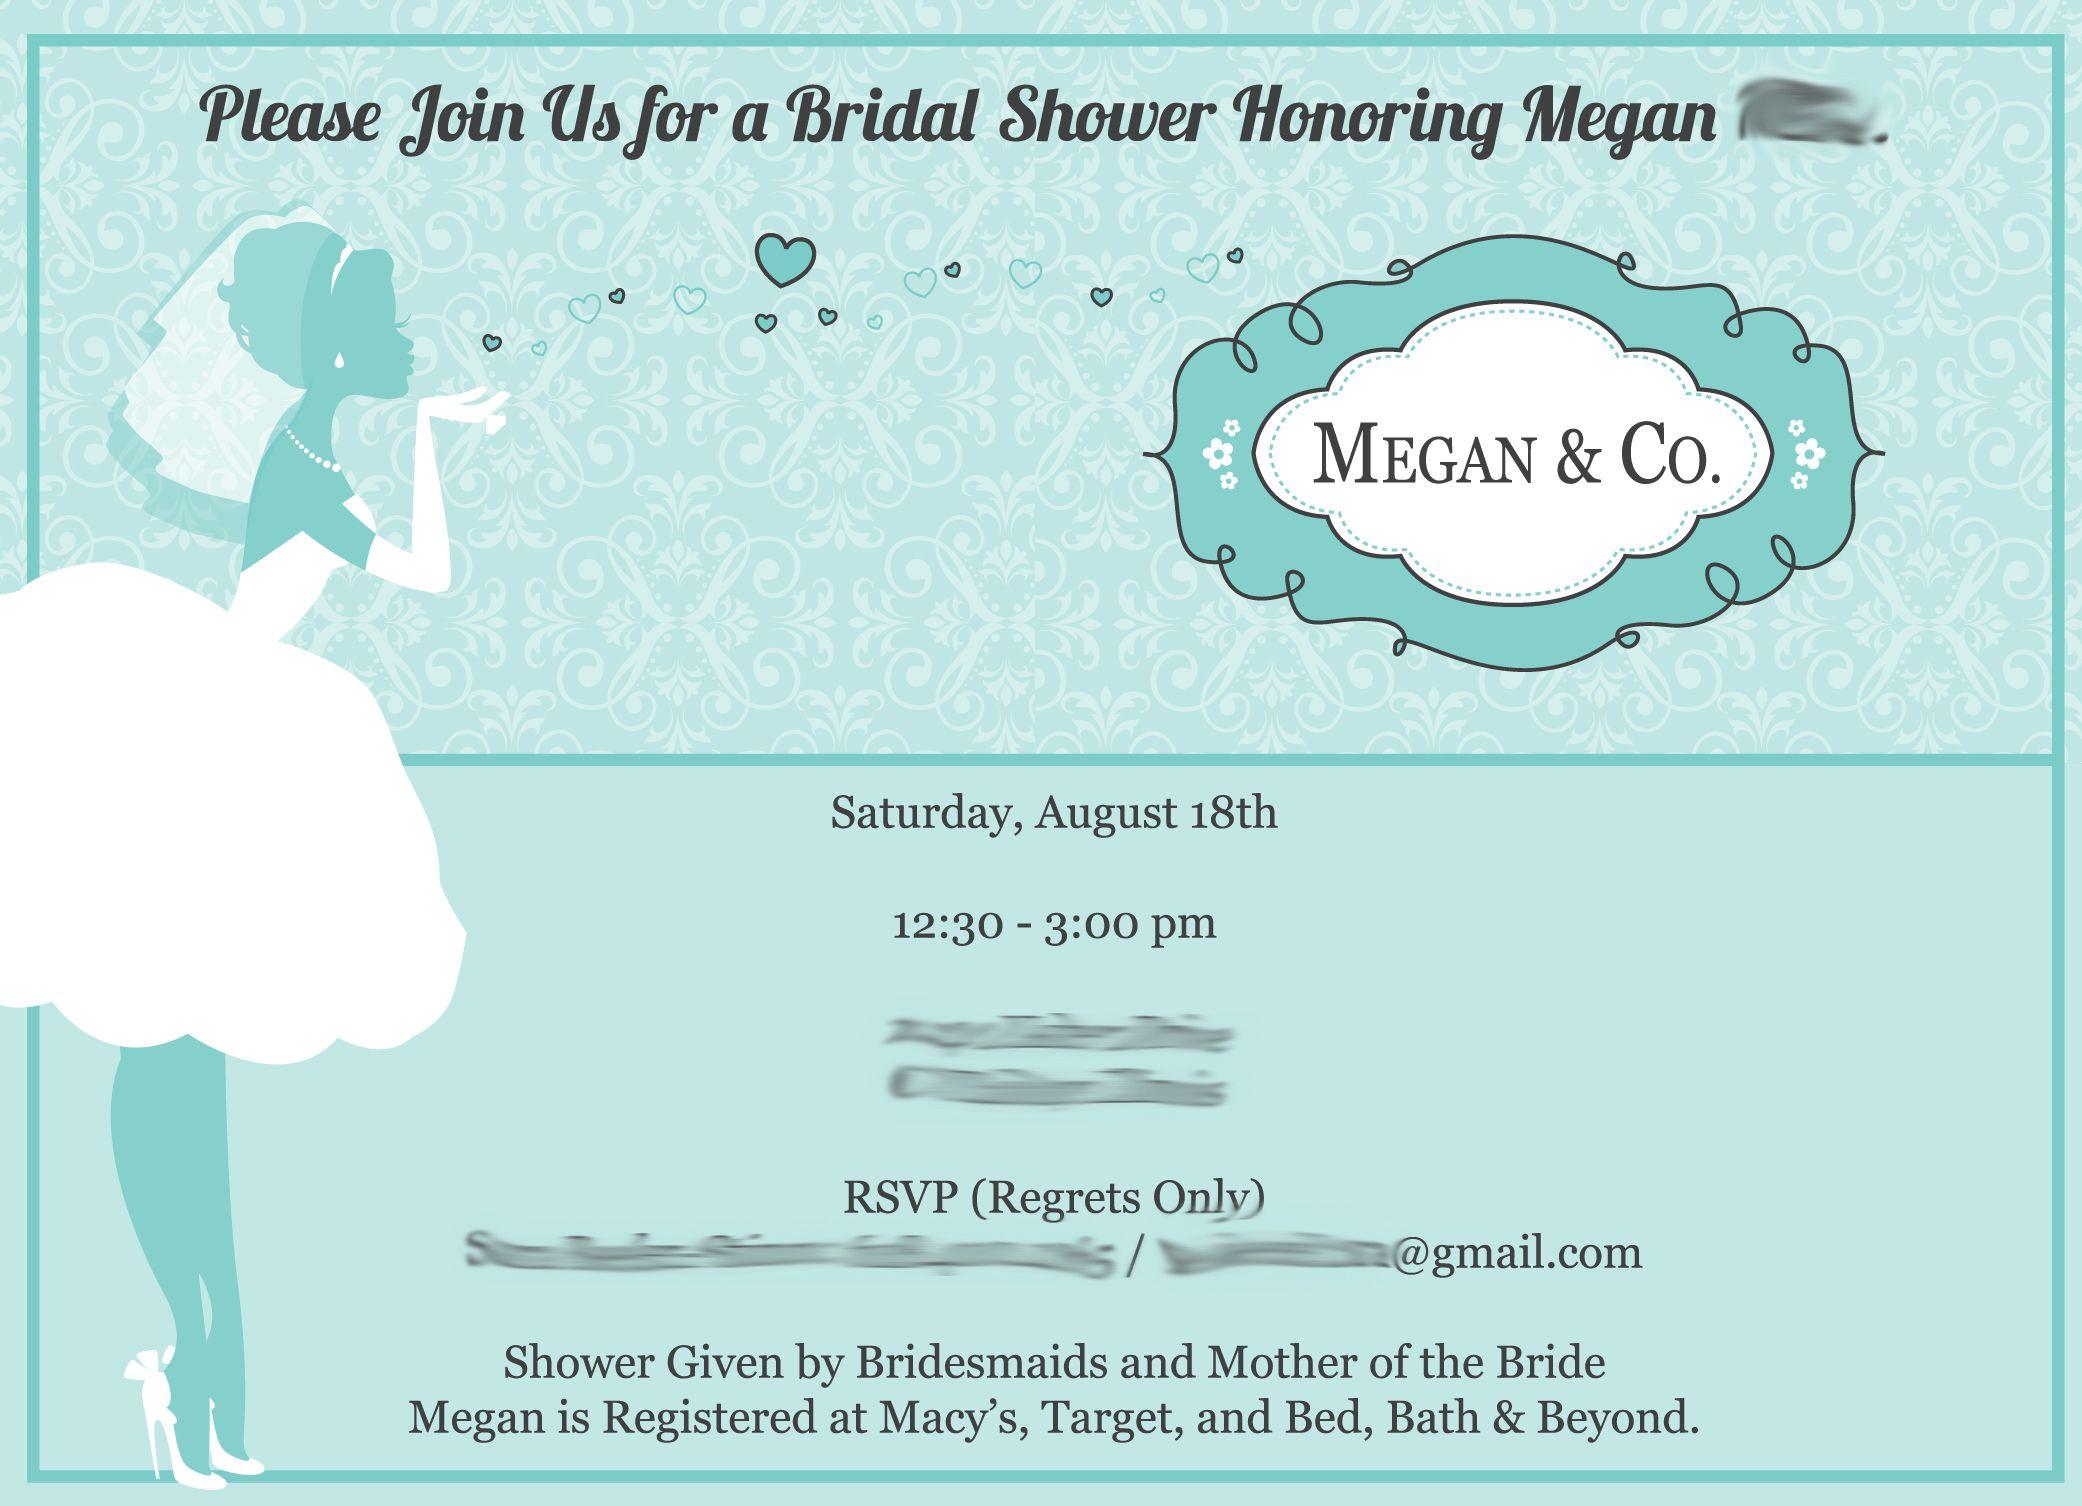 Breakfast At Tiffany's Bridal Shower Invitations Google Search: Wedding Shower Invitations Wording Formal At Reisefeber.org